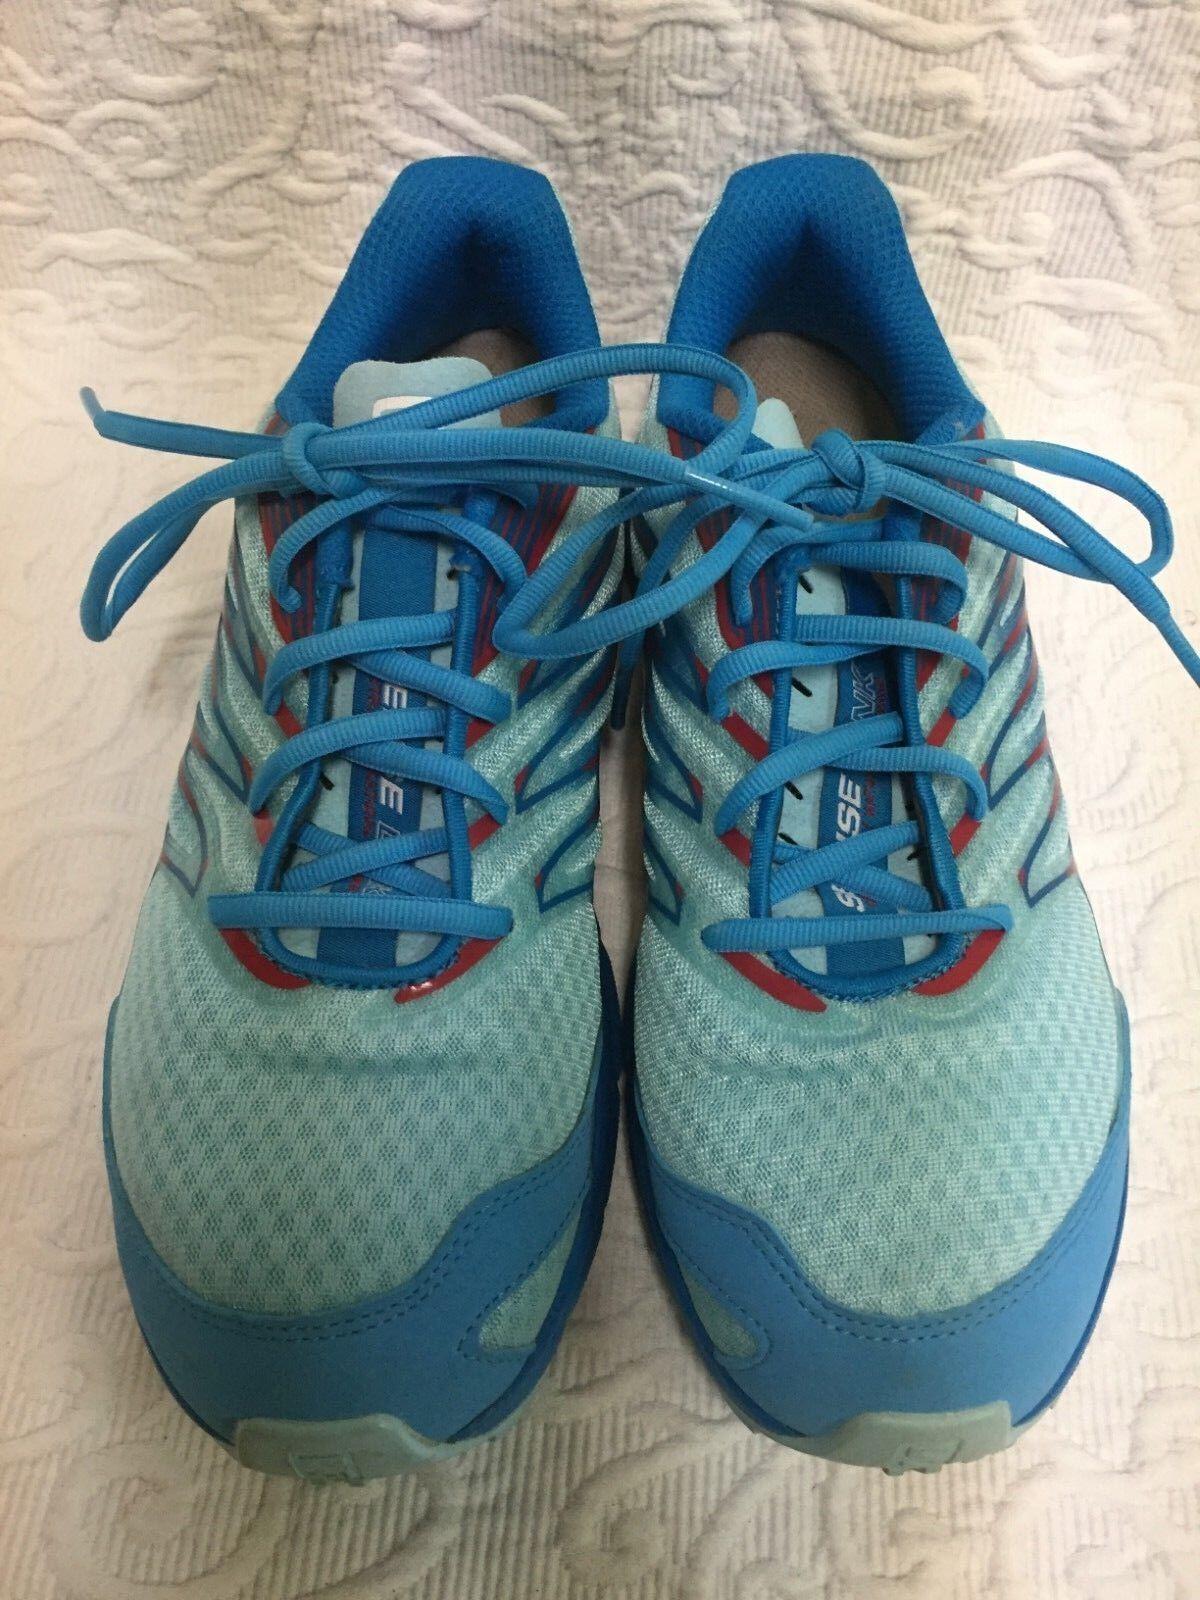 Salomon - Women's Size 8.5 bluee Sense Link Contagrip Running shoes